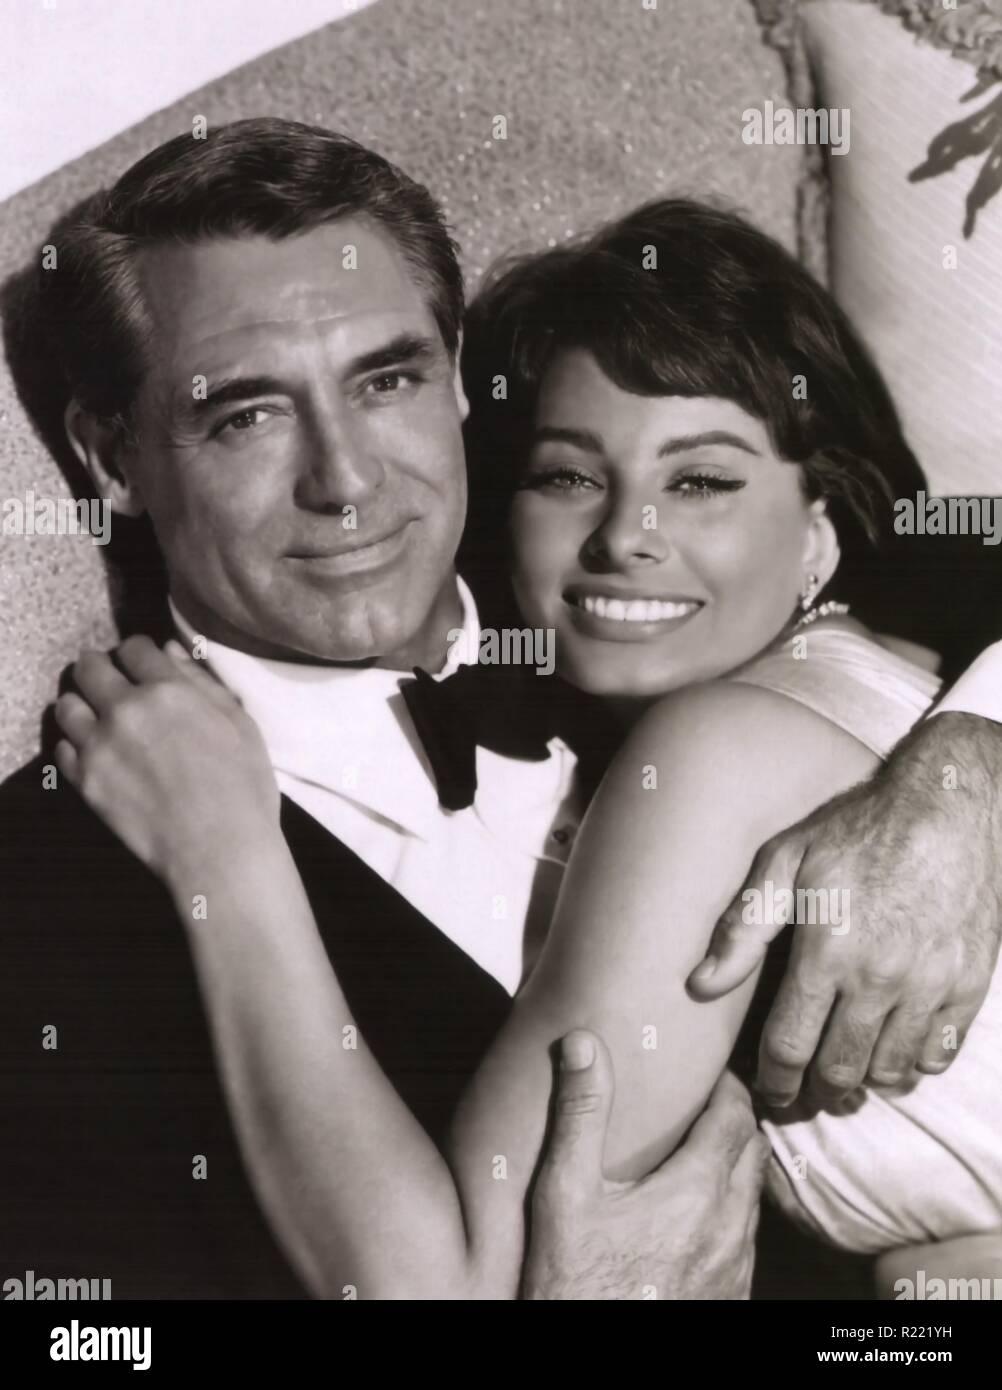 1958 American Technicolor romantic comedy VistaVision film starring Cary Grant, Sophia Loren, Martha Hyer, and Harry Guardino. Credit: Hollywood Photo Archive / MediaPunch - Stock Image